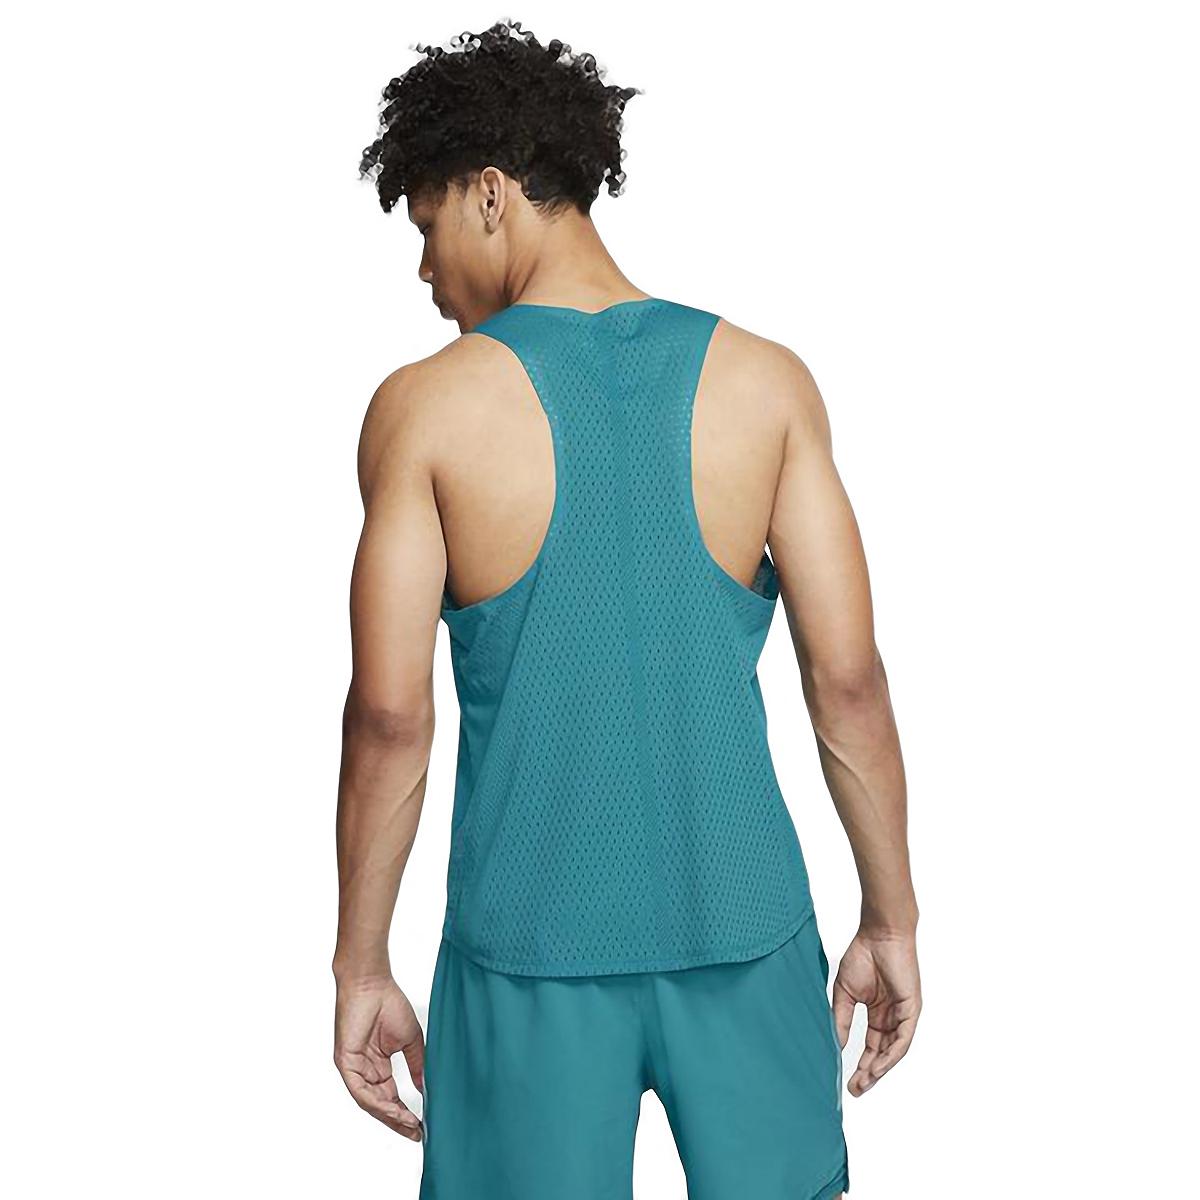 Men's Nike AeroSwift Singlet  - Color: Bright Spruce - Size: S, Bright Spruce, large, image 2